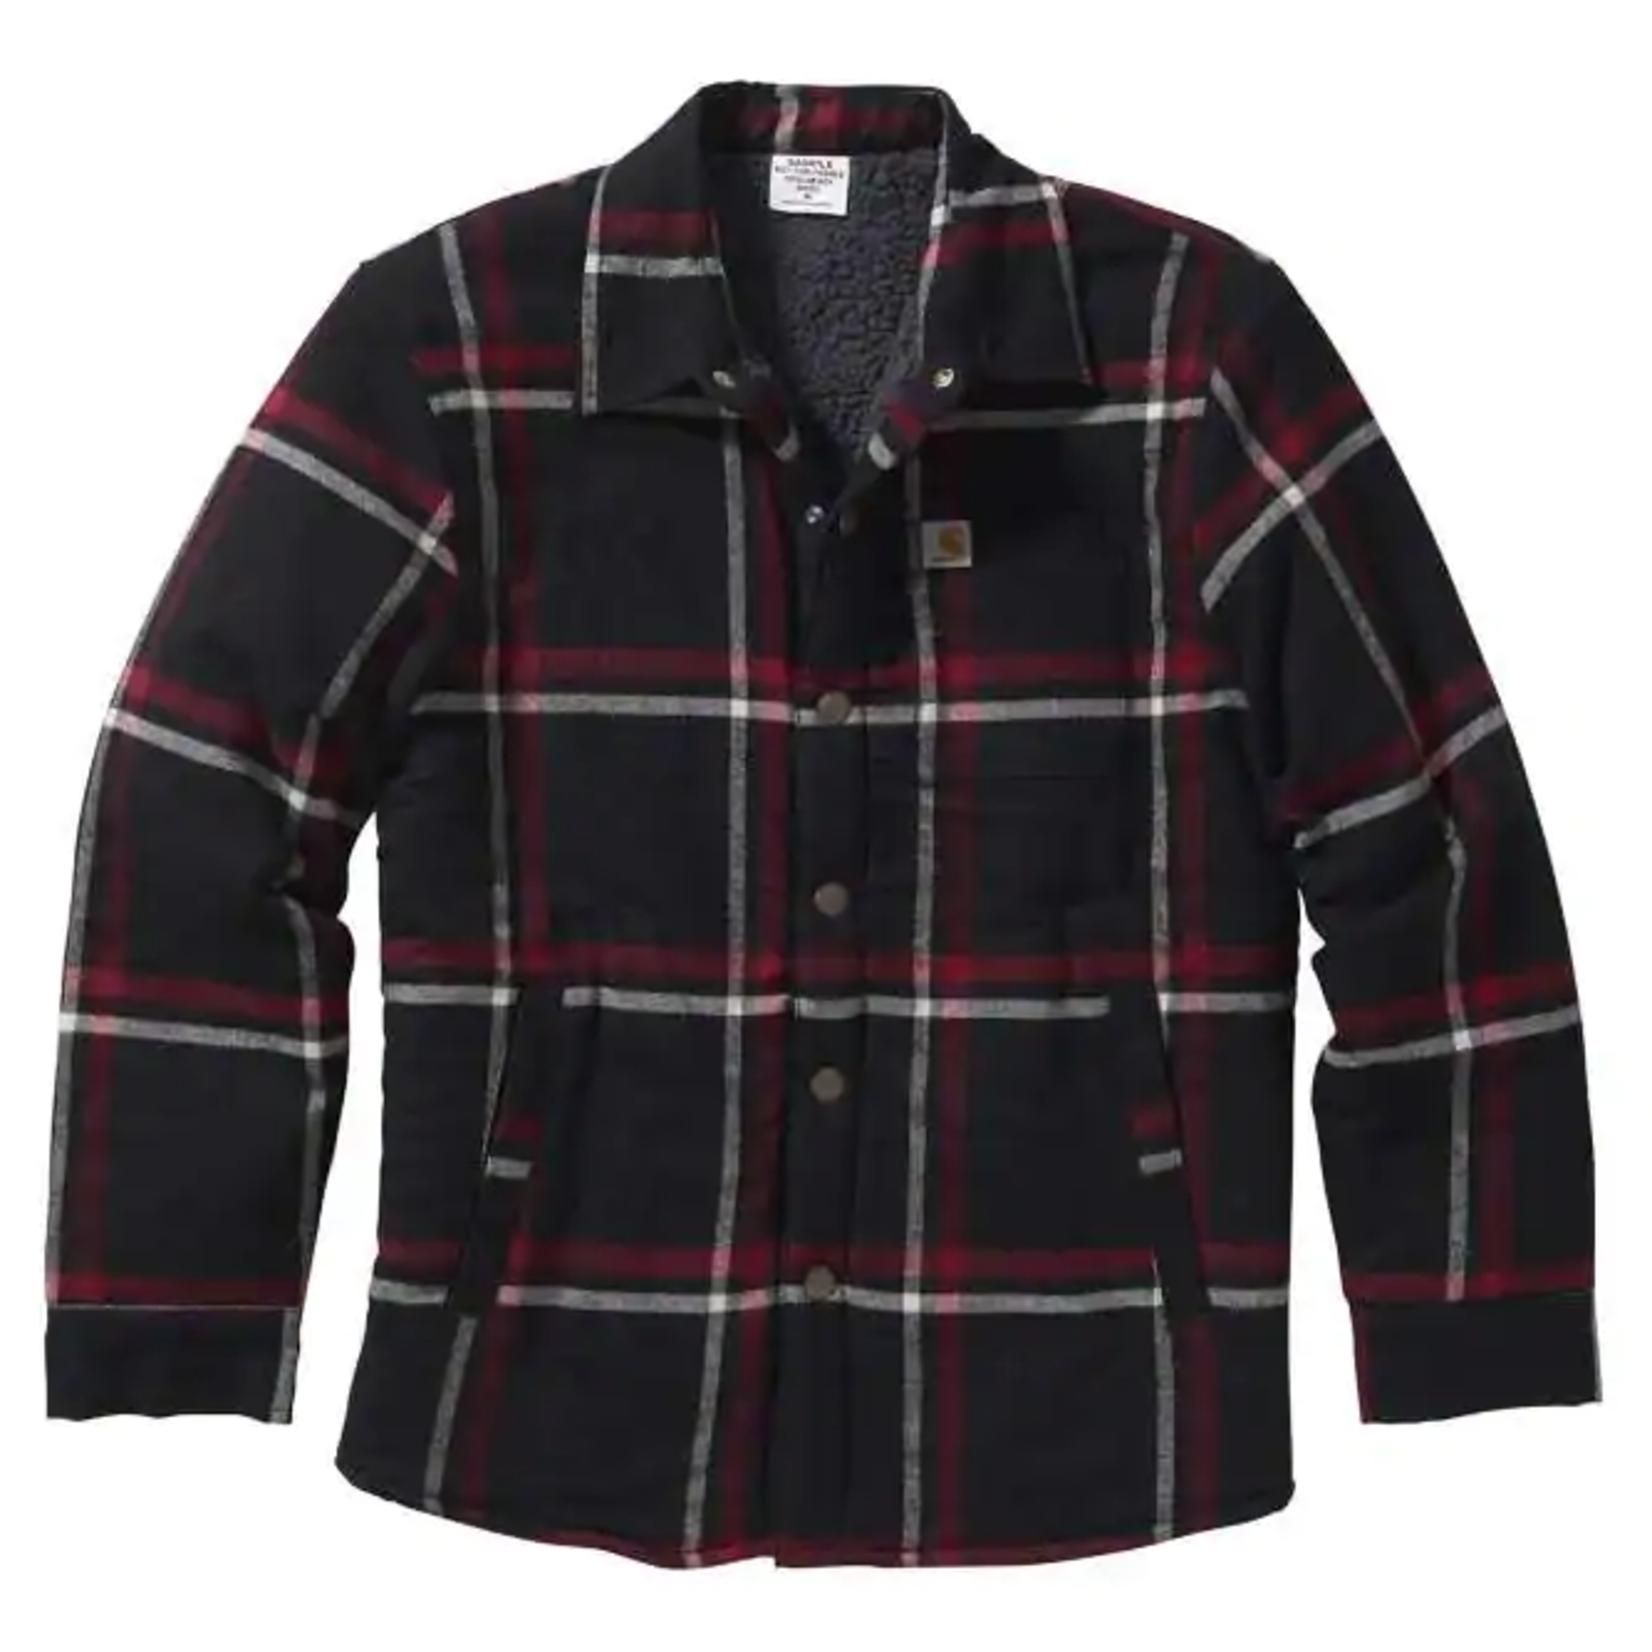 Carhartt Carhartt Kids CP8544 Sherpa-Lined Youth Shirt Jacket - 2 Colors